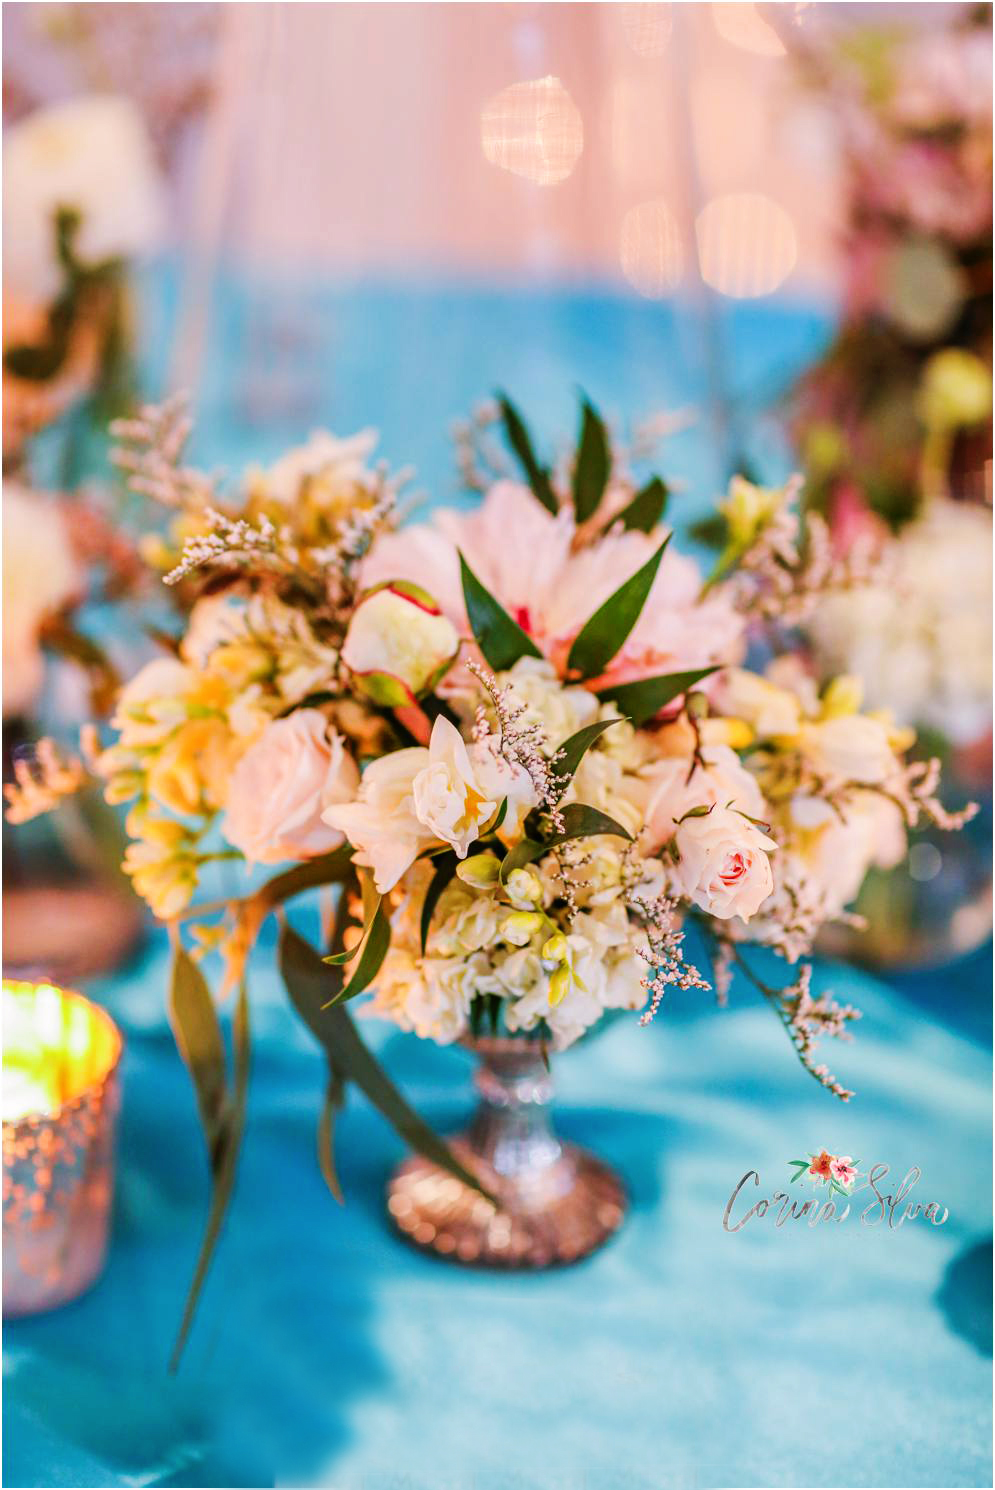 White-blue-hidrangeas-orchids-wedding-decorations, Corina-Silva-Decor-Photography-13.jpg